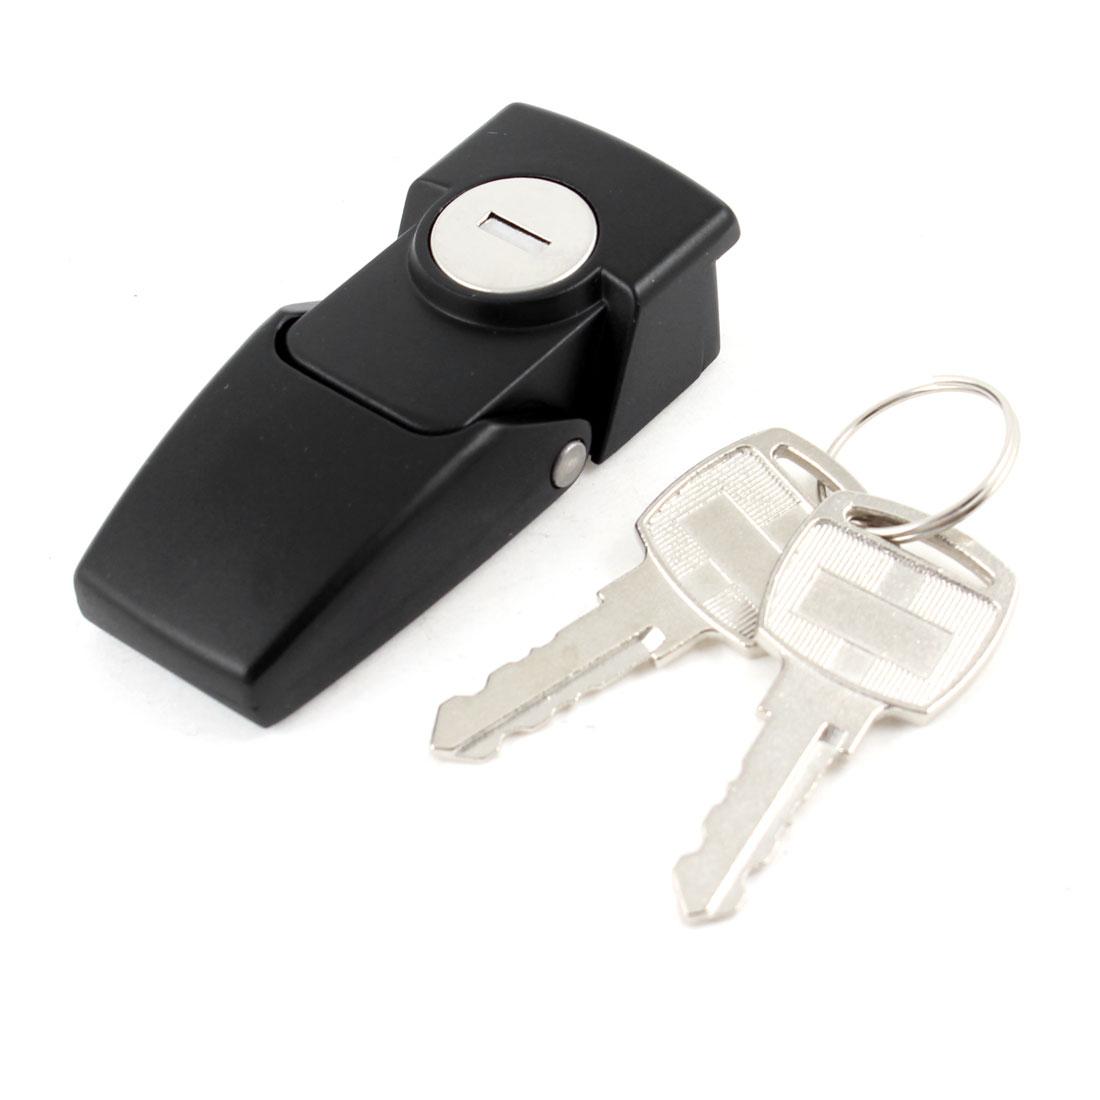 Cabinets Spring Load Metallic Hasp Latch Lock w Keys